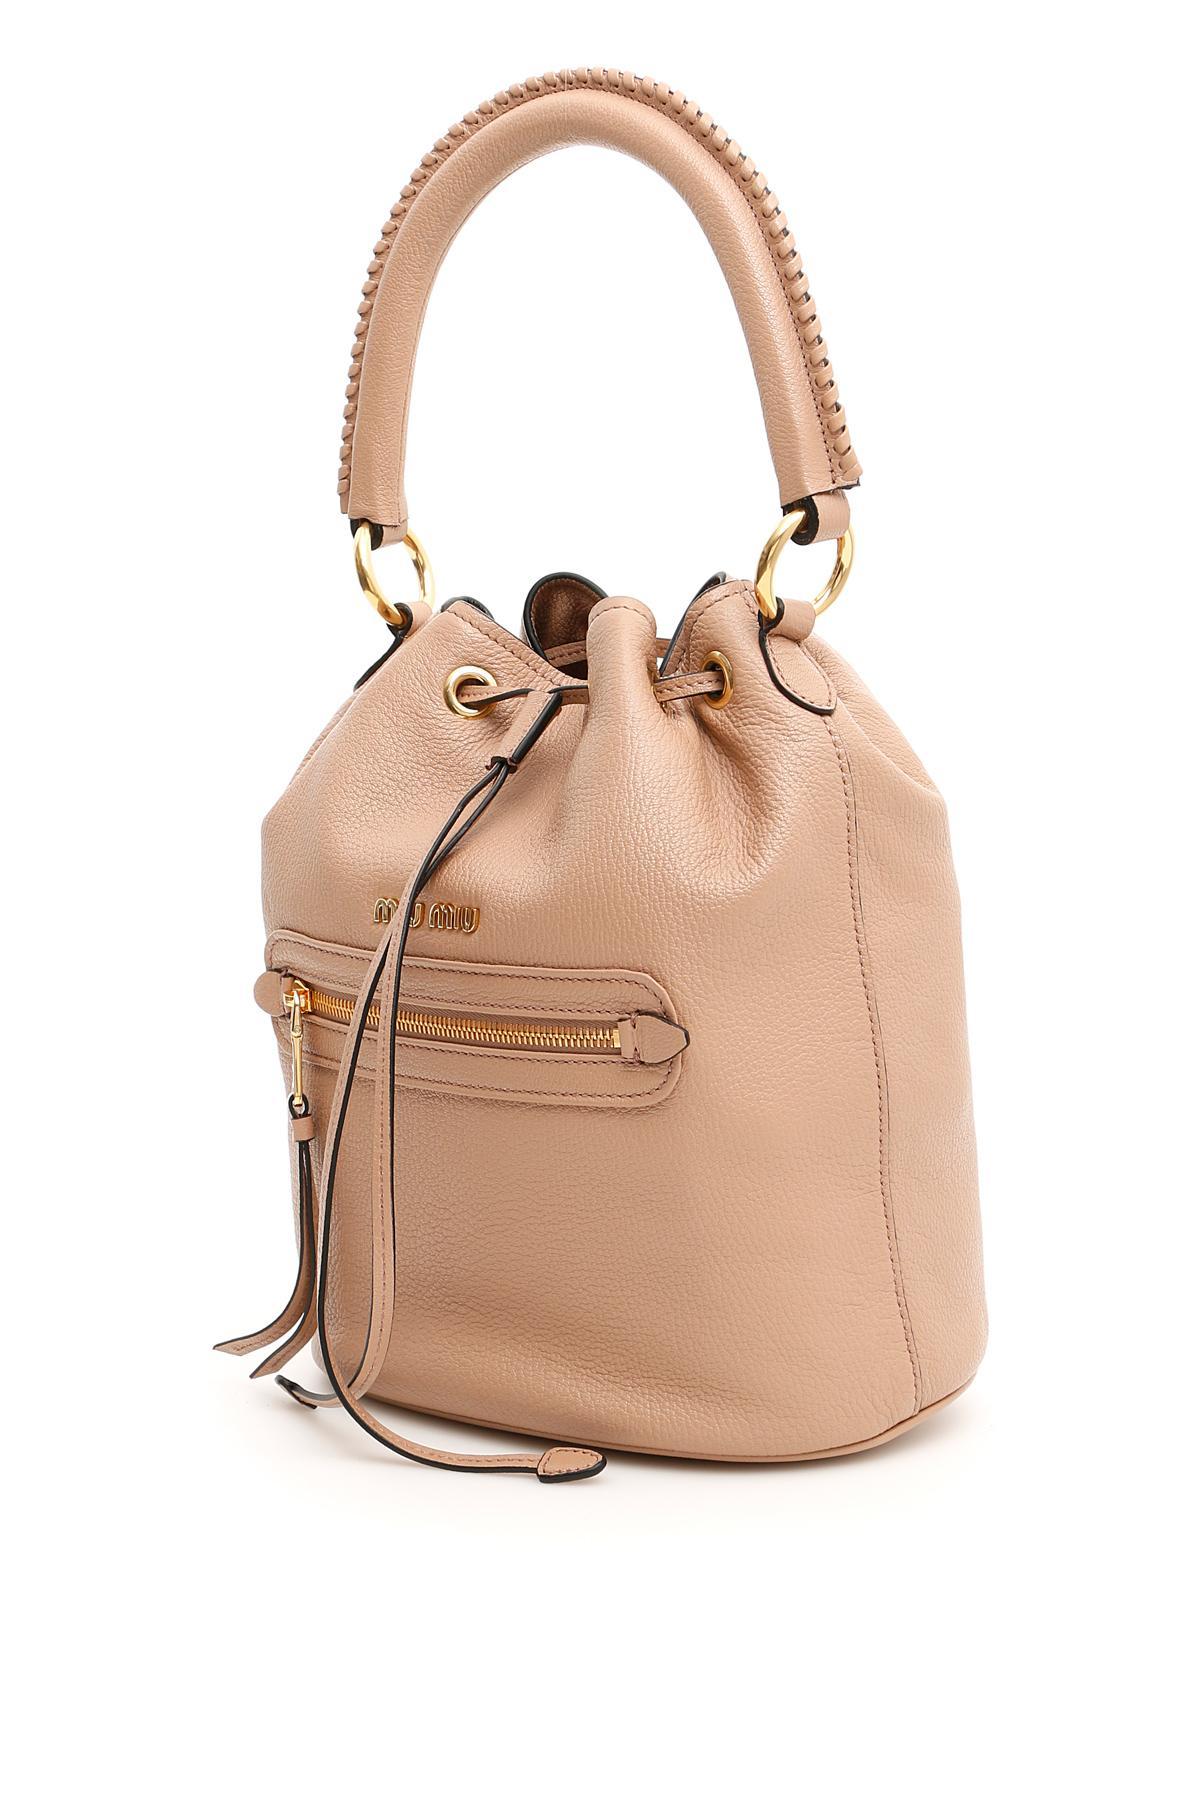 7895899219d Lyst - Miu Miu Madras Bucket Bag